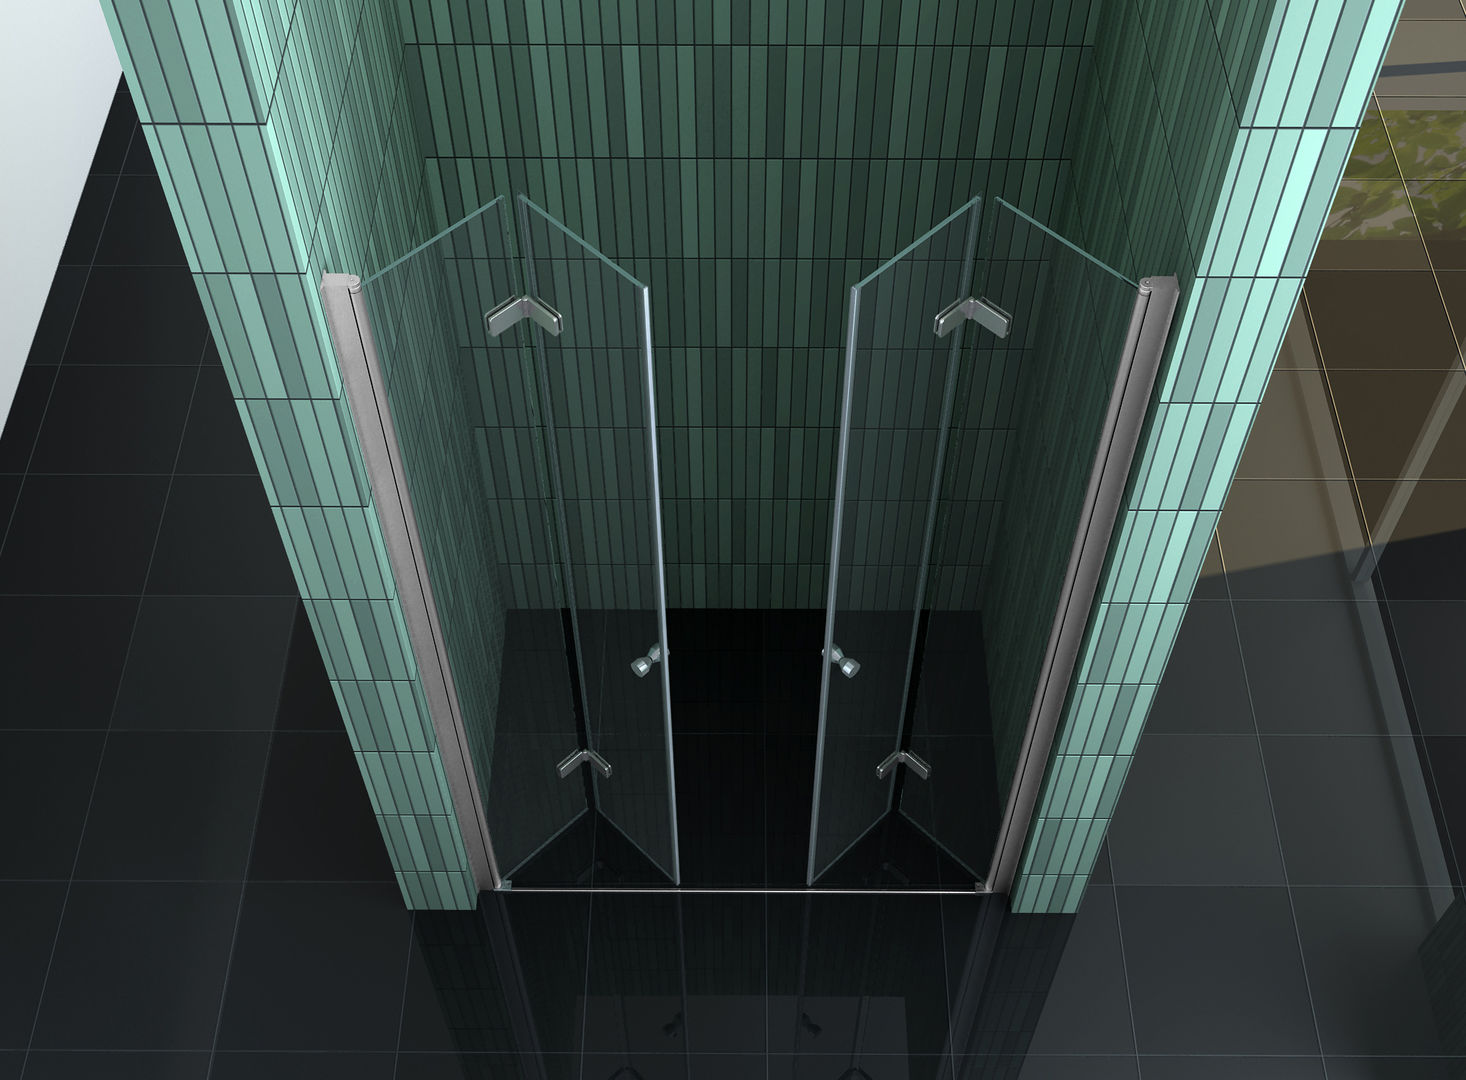 75 - 140 x 195 cm faltbare Nischentür Duschwand Duschtür ... | {Duschabtrennung faltbar 59}